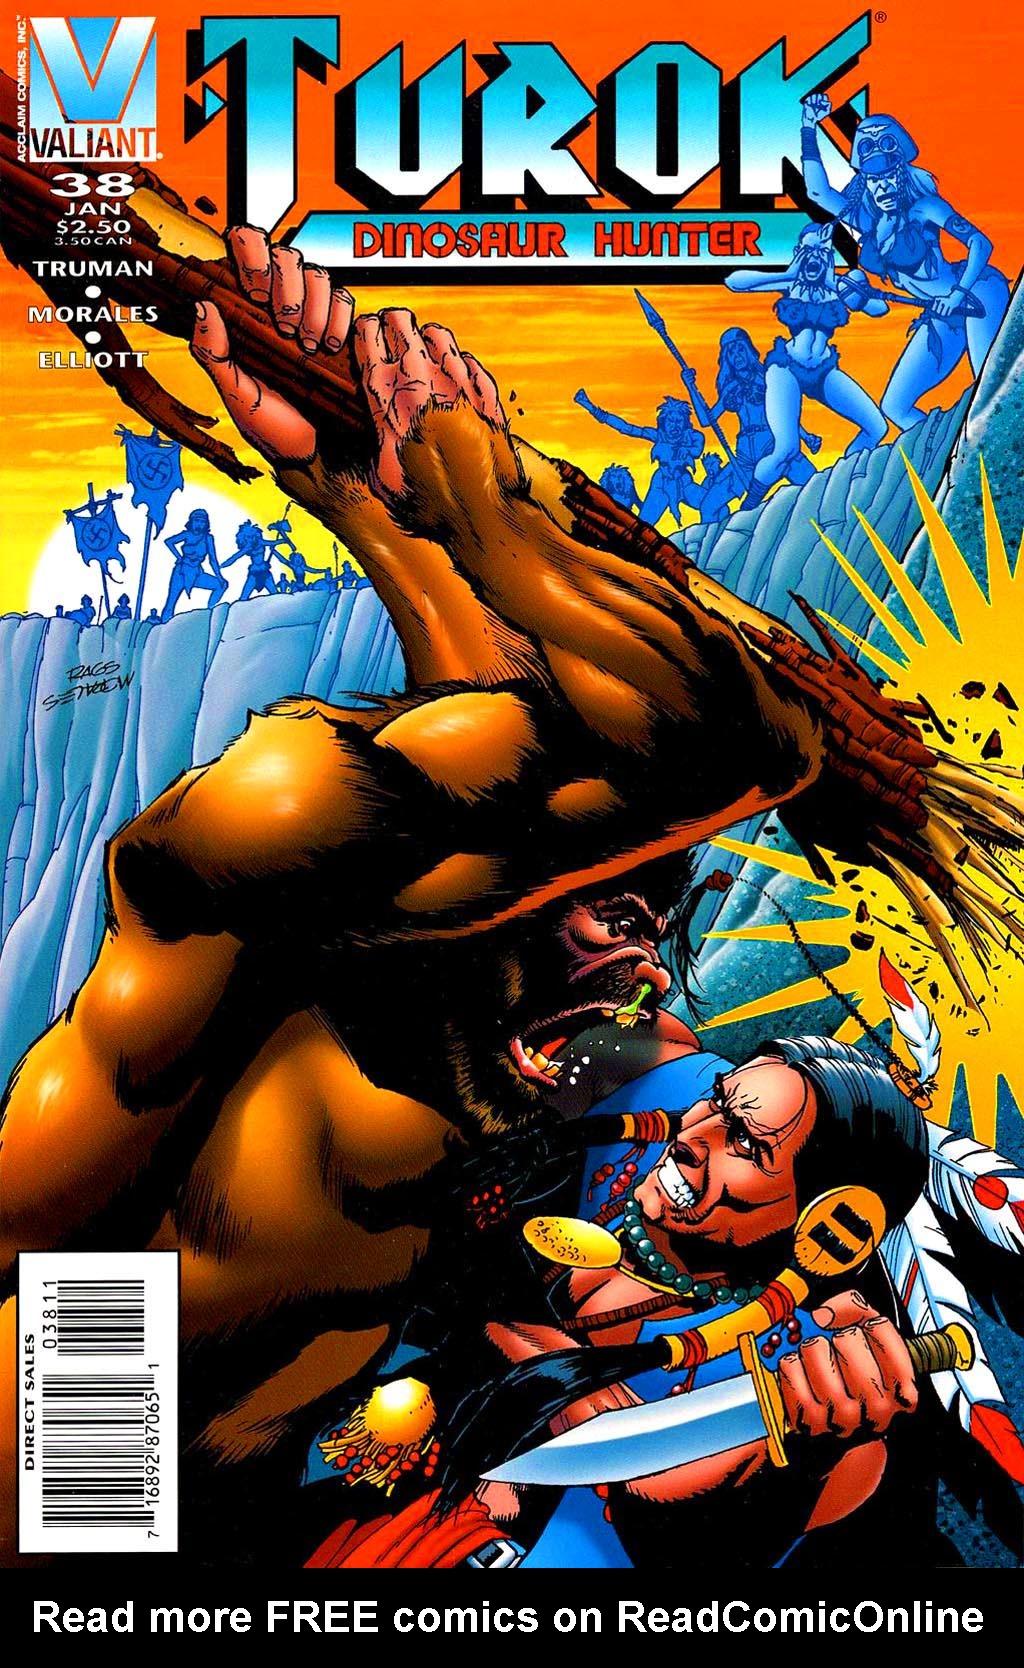 Read online Turok, Dinosaur Hunter (1993) comic -  Issue #38 - 2